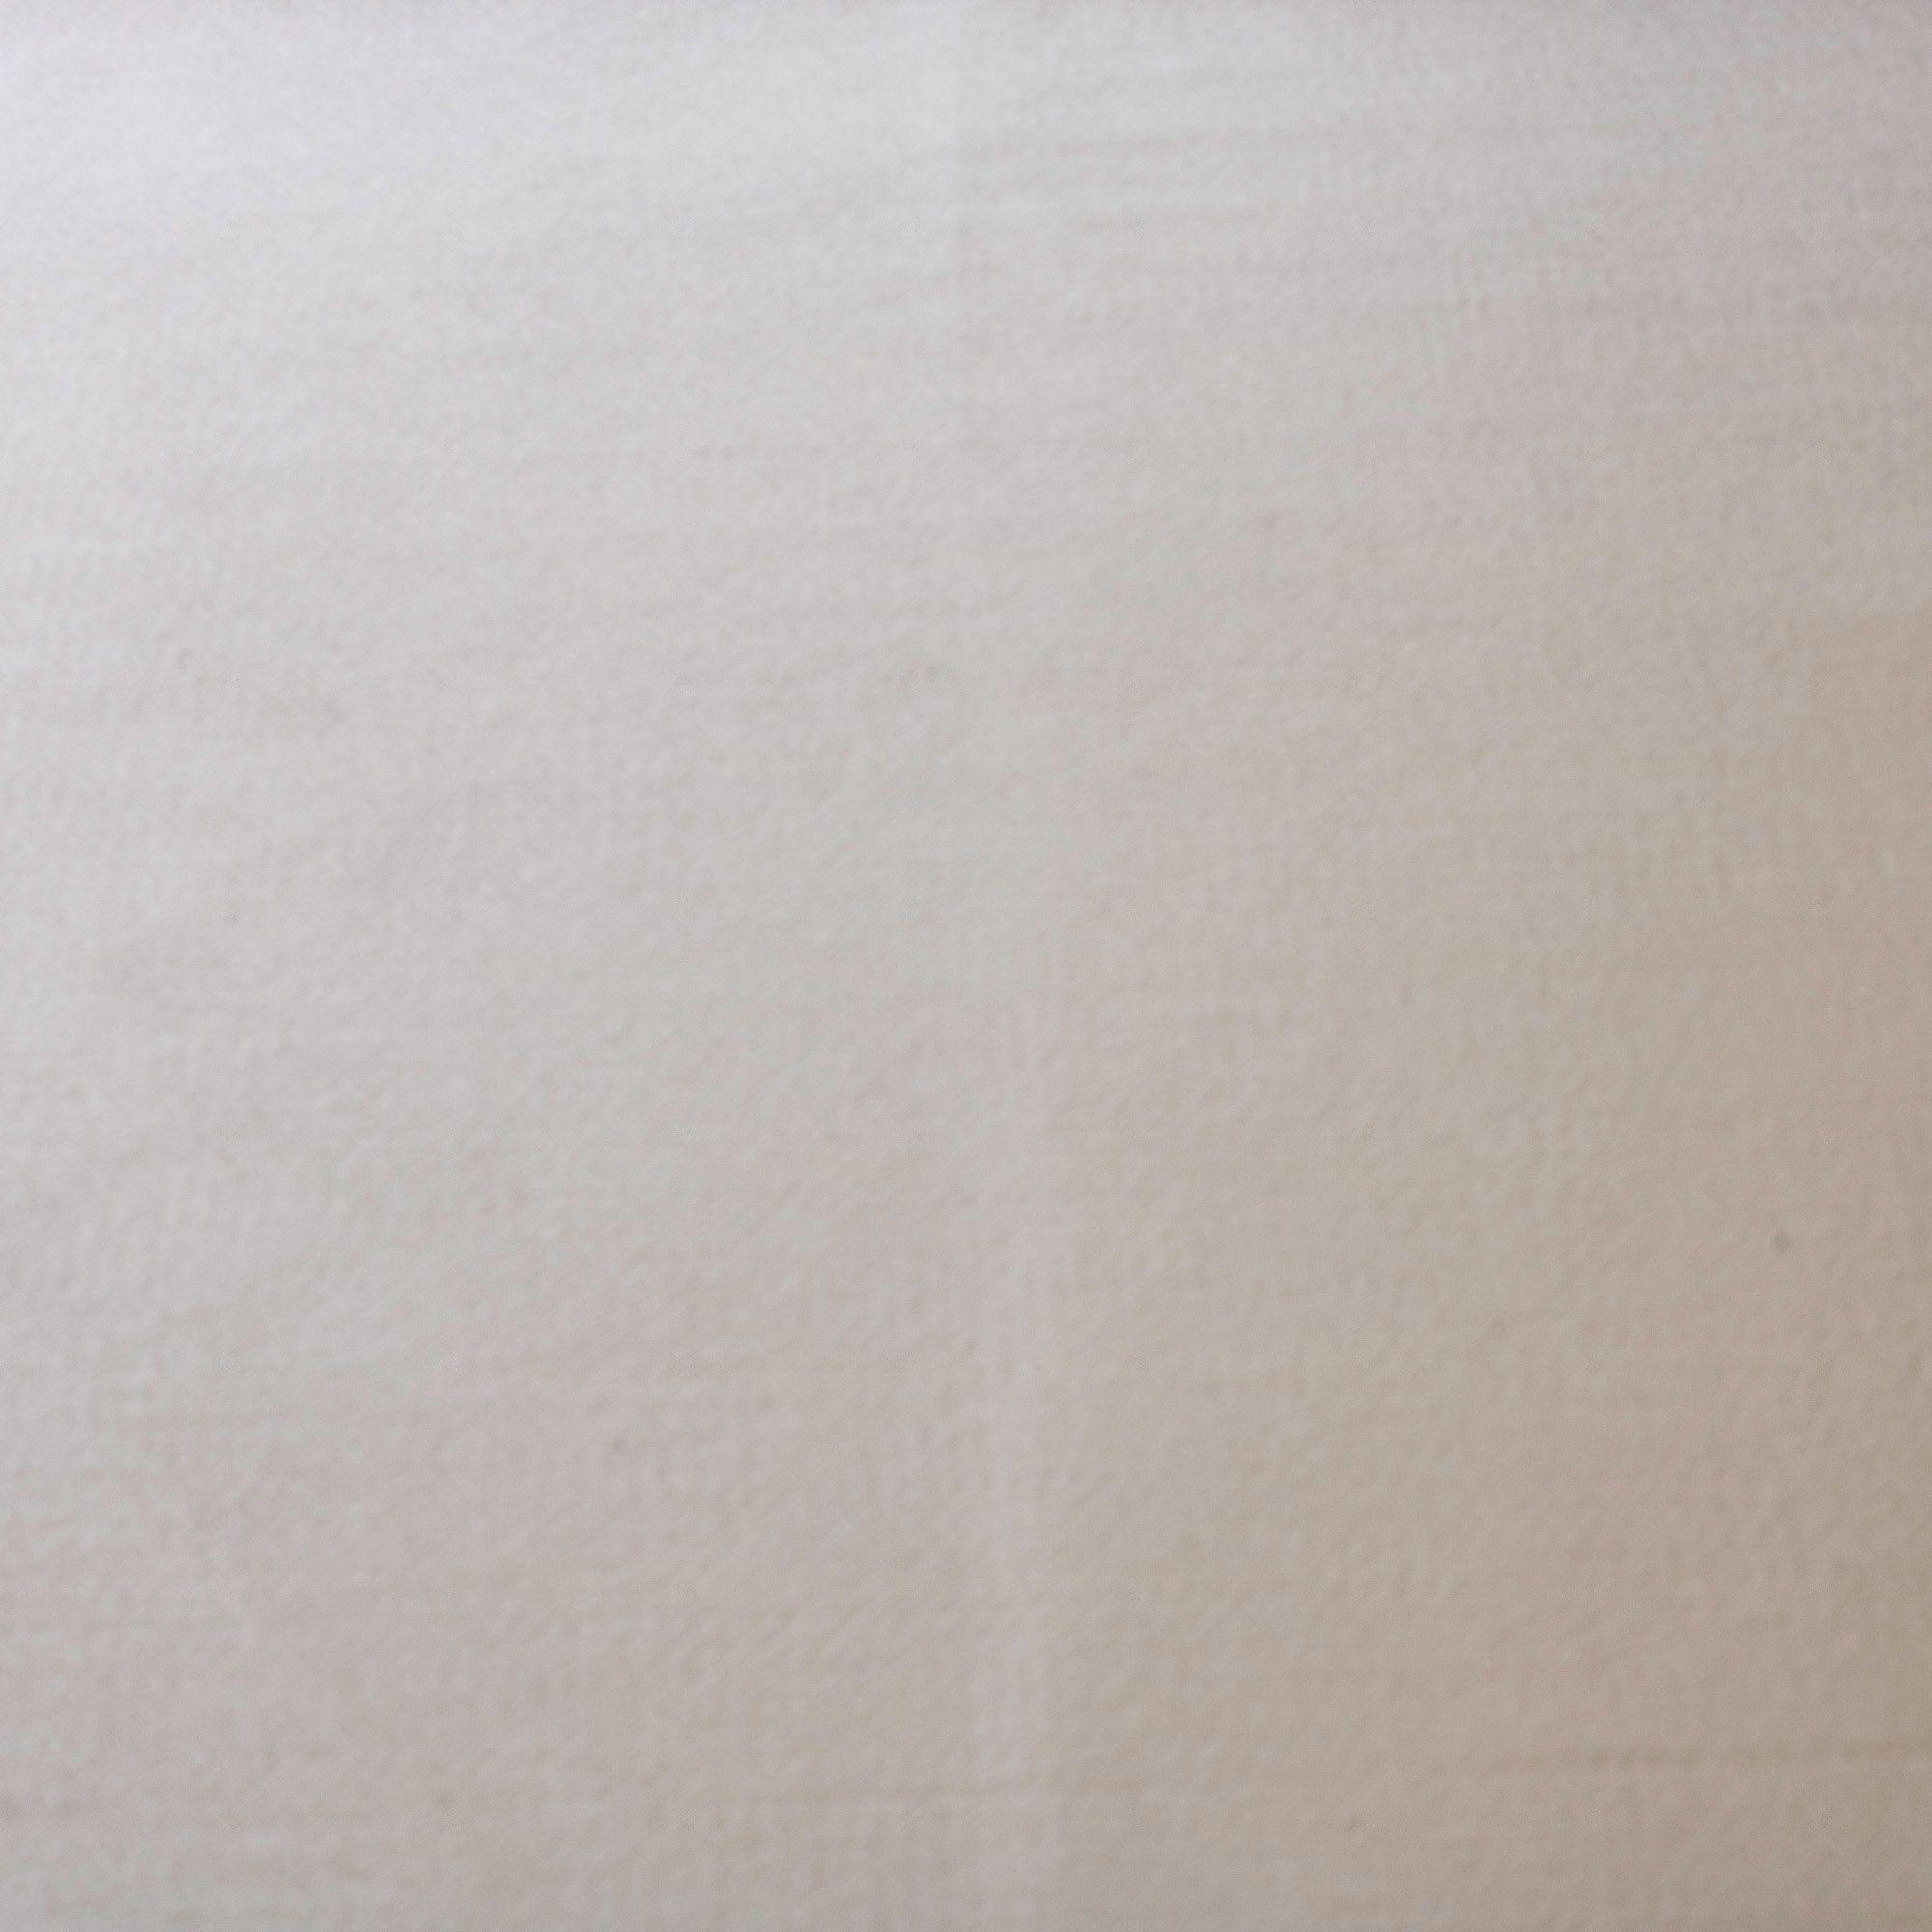 Tecido Feltro Branco 100% Poliester 1,40 Mt Largura